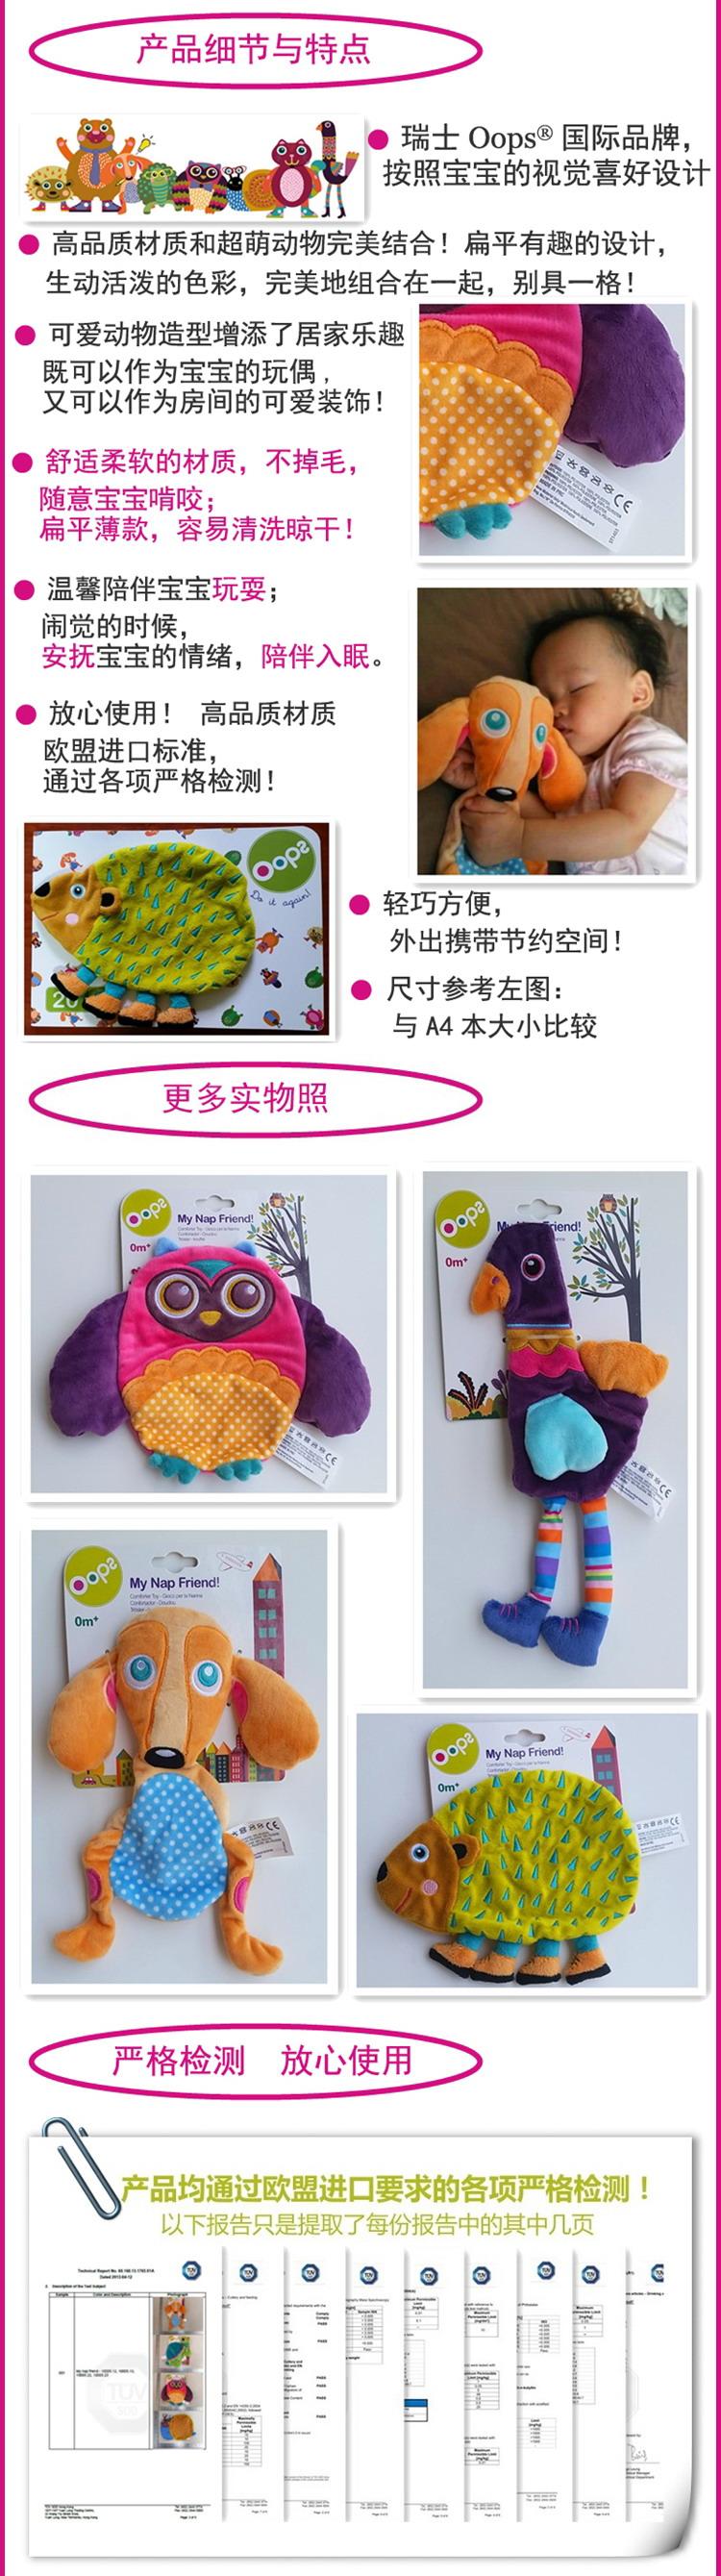 oops my nap friend baby comfortor baby soft toys 宝宝午睡安抚巾玩偶布偶